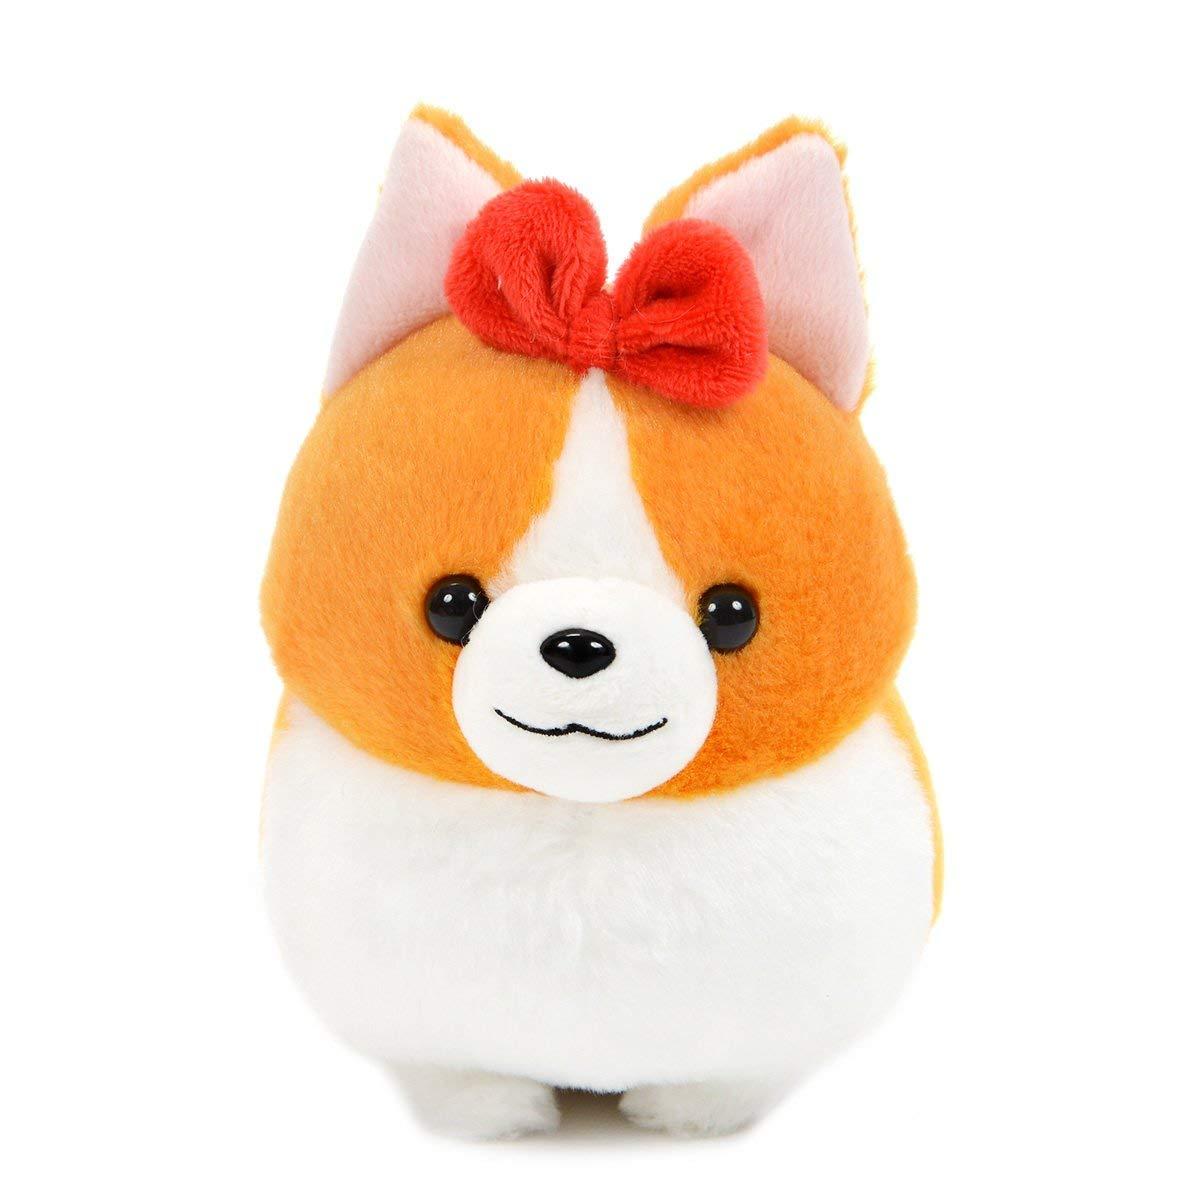 Amuse Corgi Plush Doll Ichi Ni no Dog Corgi Stuffed Animal Hana-chan White Standard Size Plushie 6 Inches